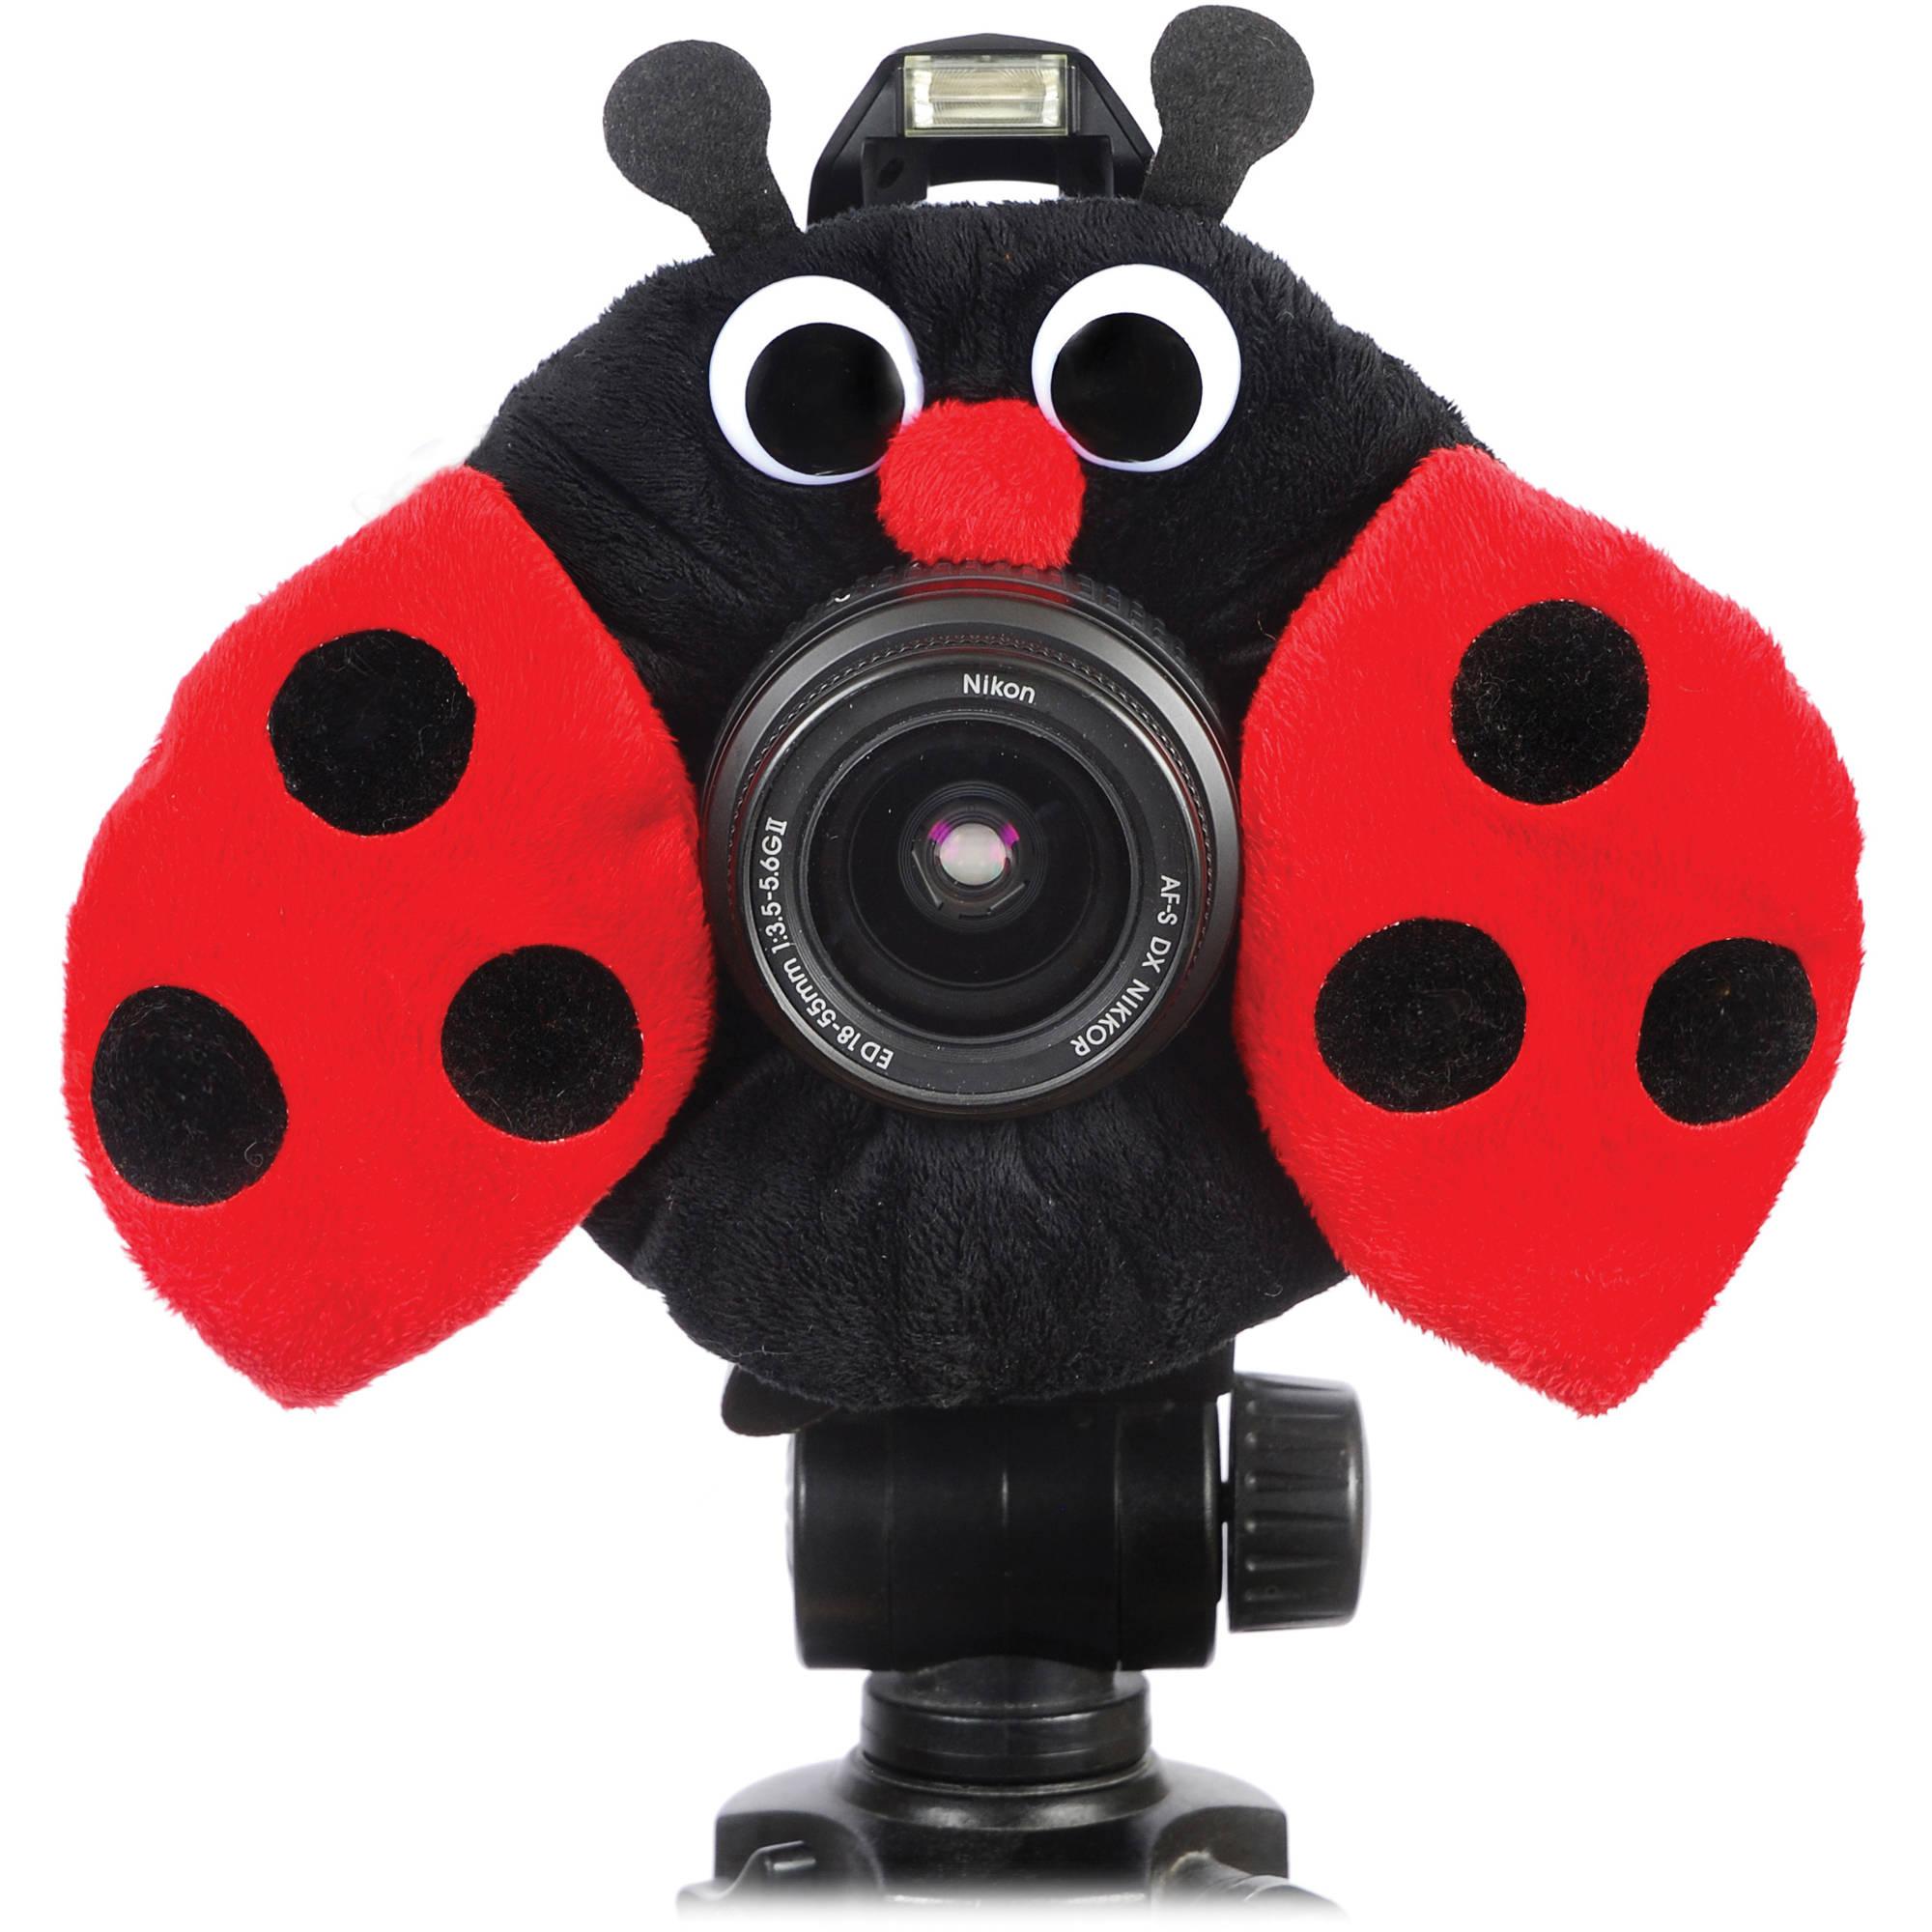 camera creatures look at me ladybug posing prop ccll001 b u0026h